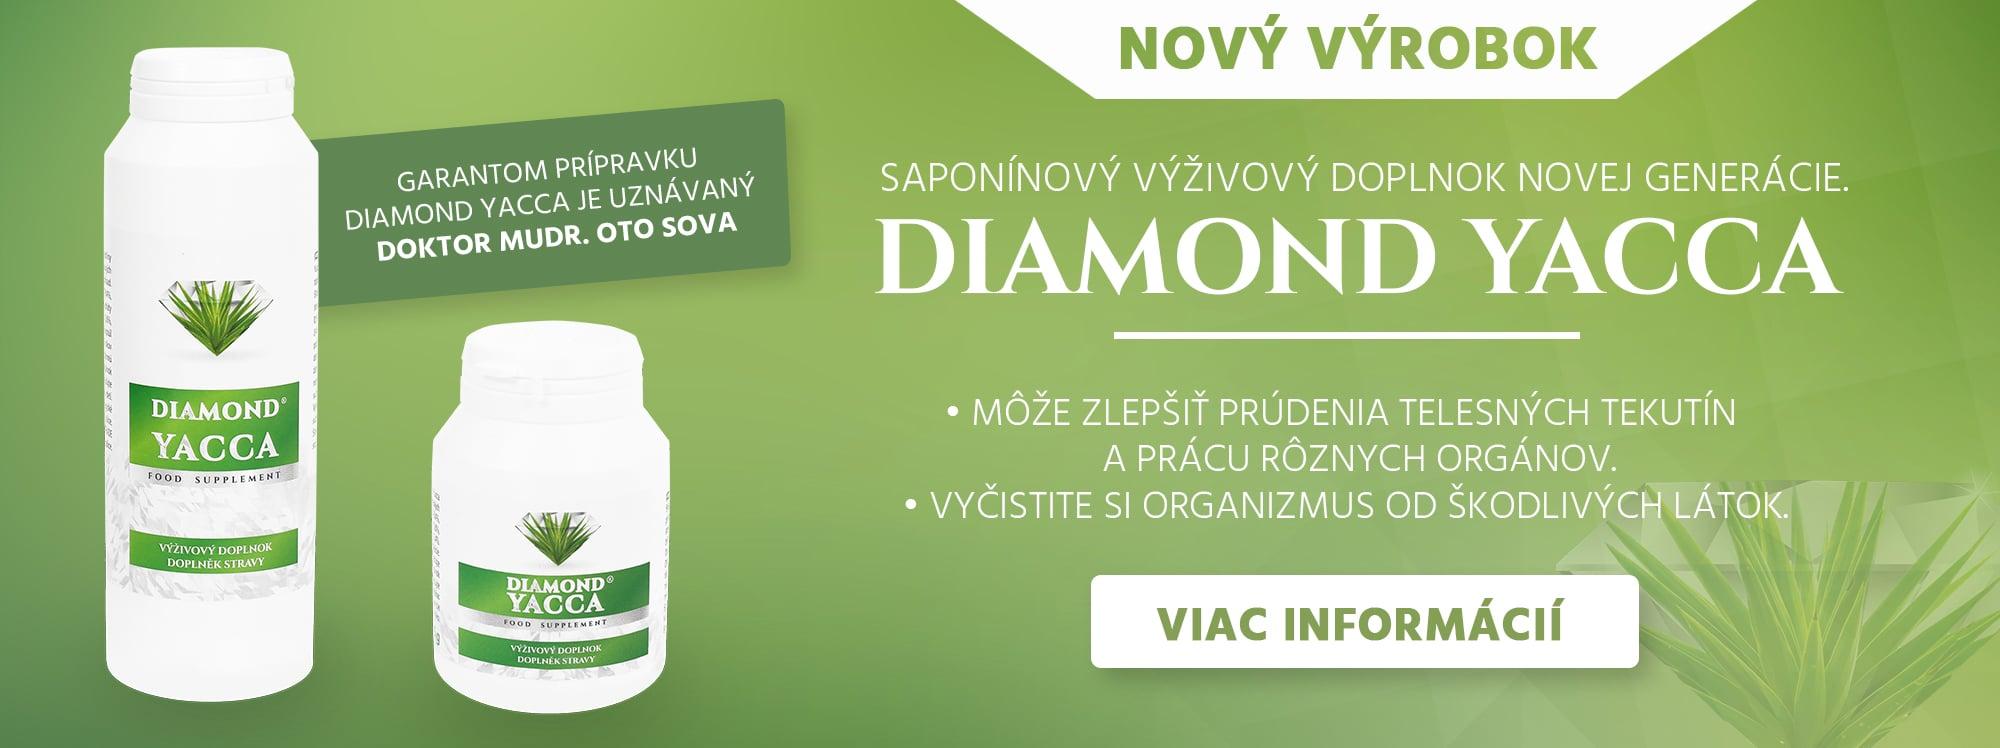 diamond_yacca_sk_banner-1